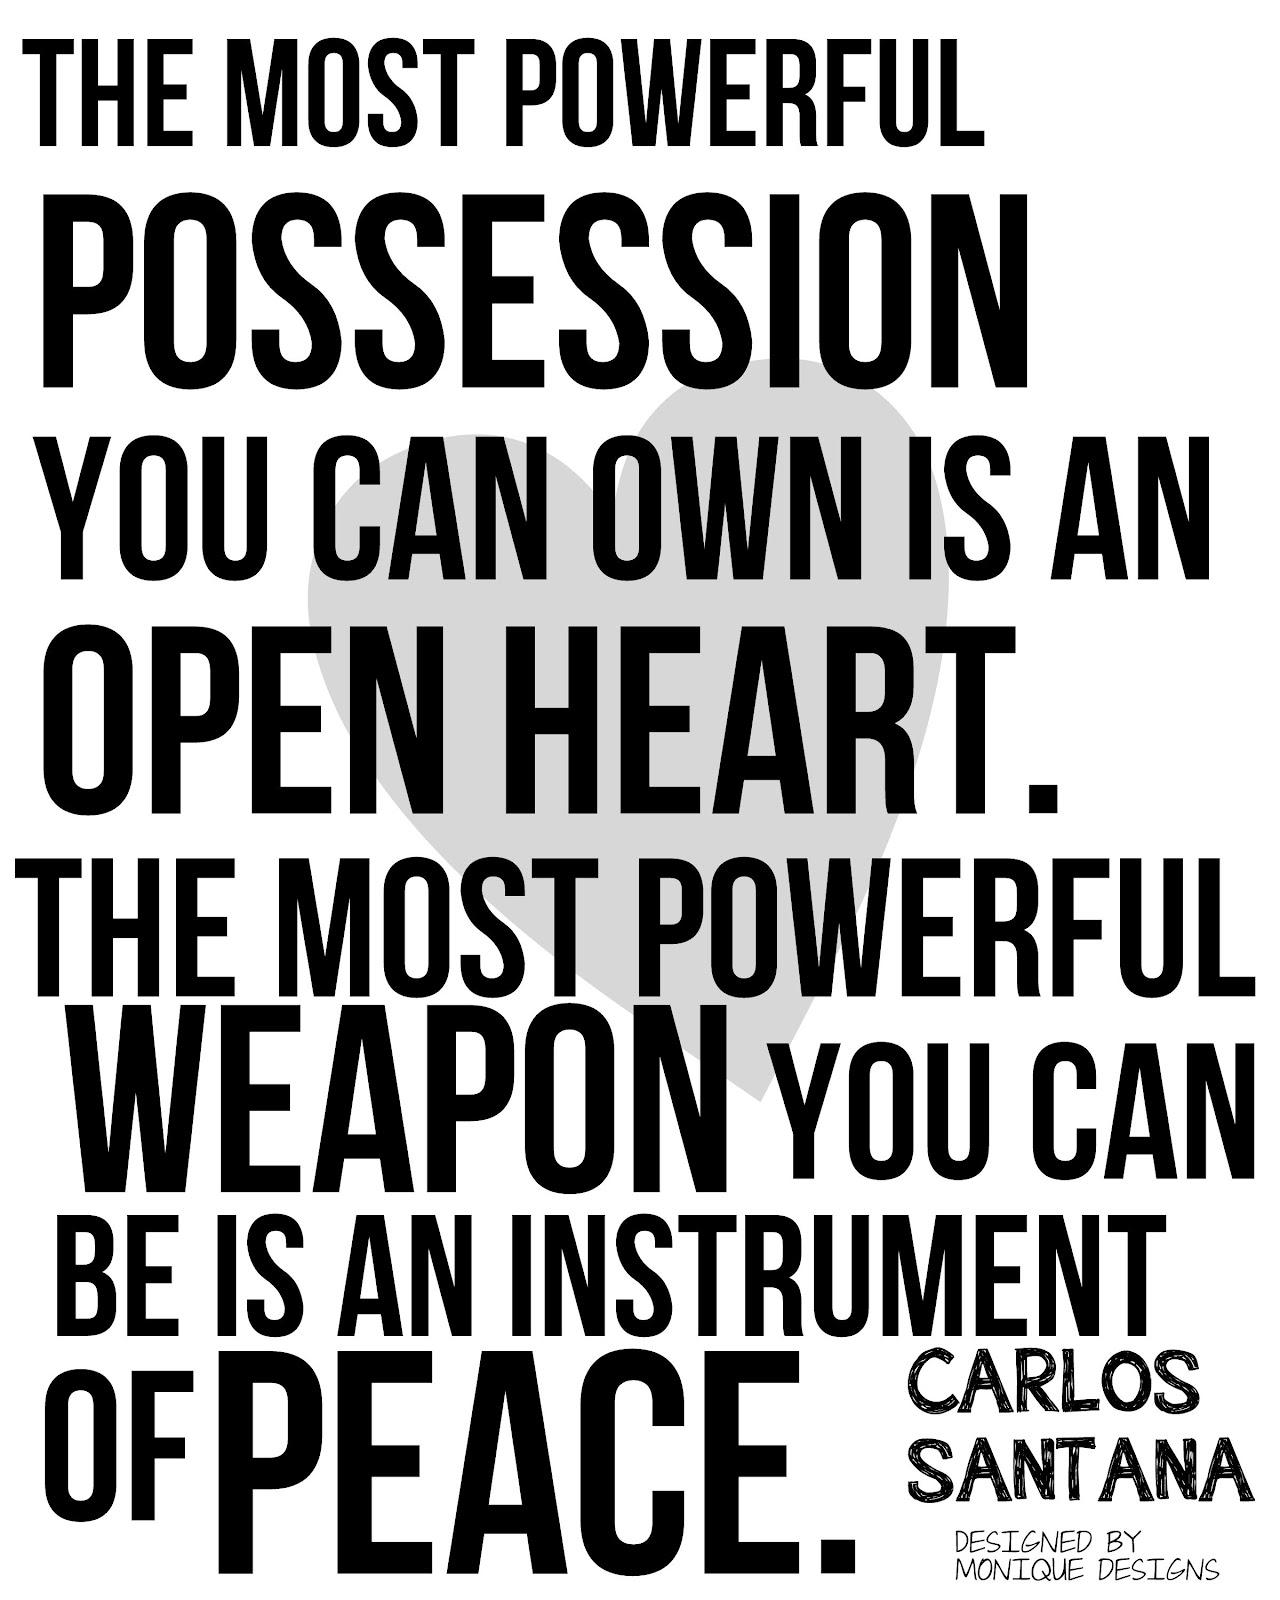 Carlos Santana's quote #7